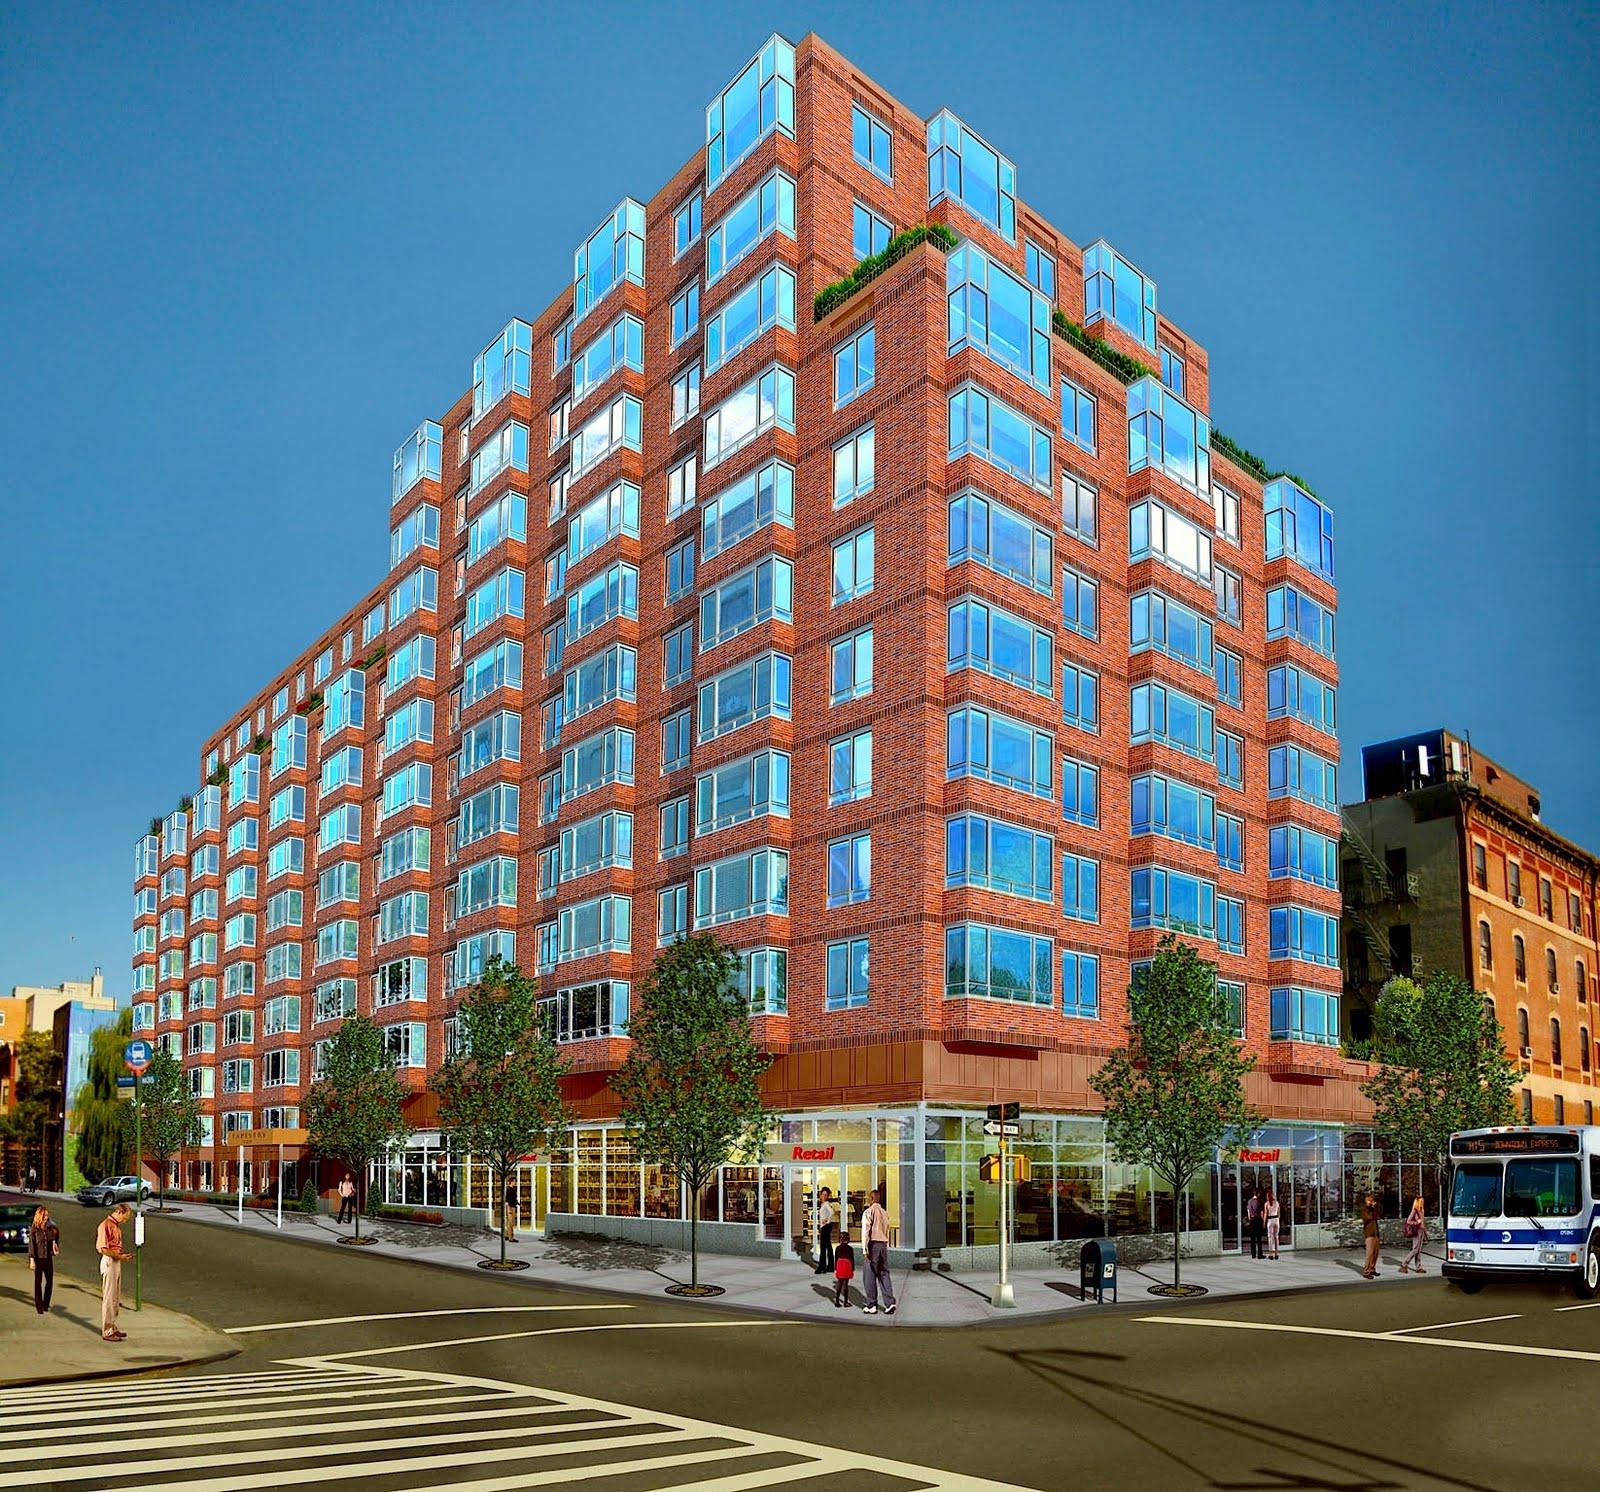 H A R L E M + B E S P O K E: ☞ DWELL: Tapestry to Debut in East Harlem